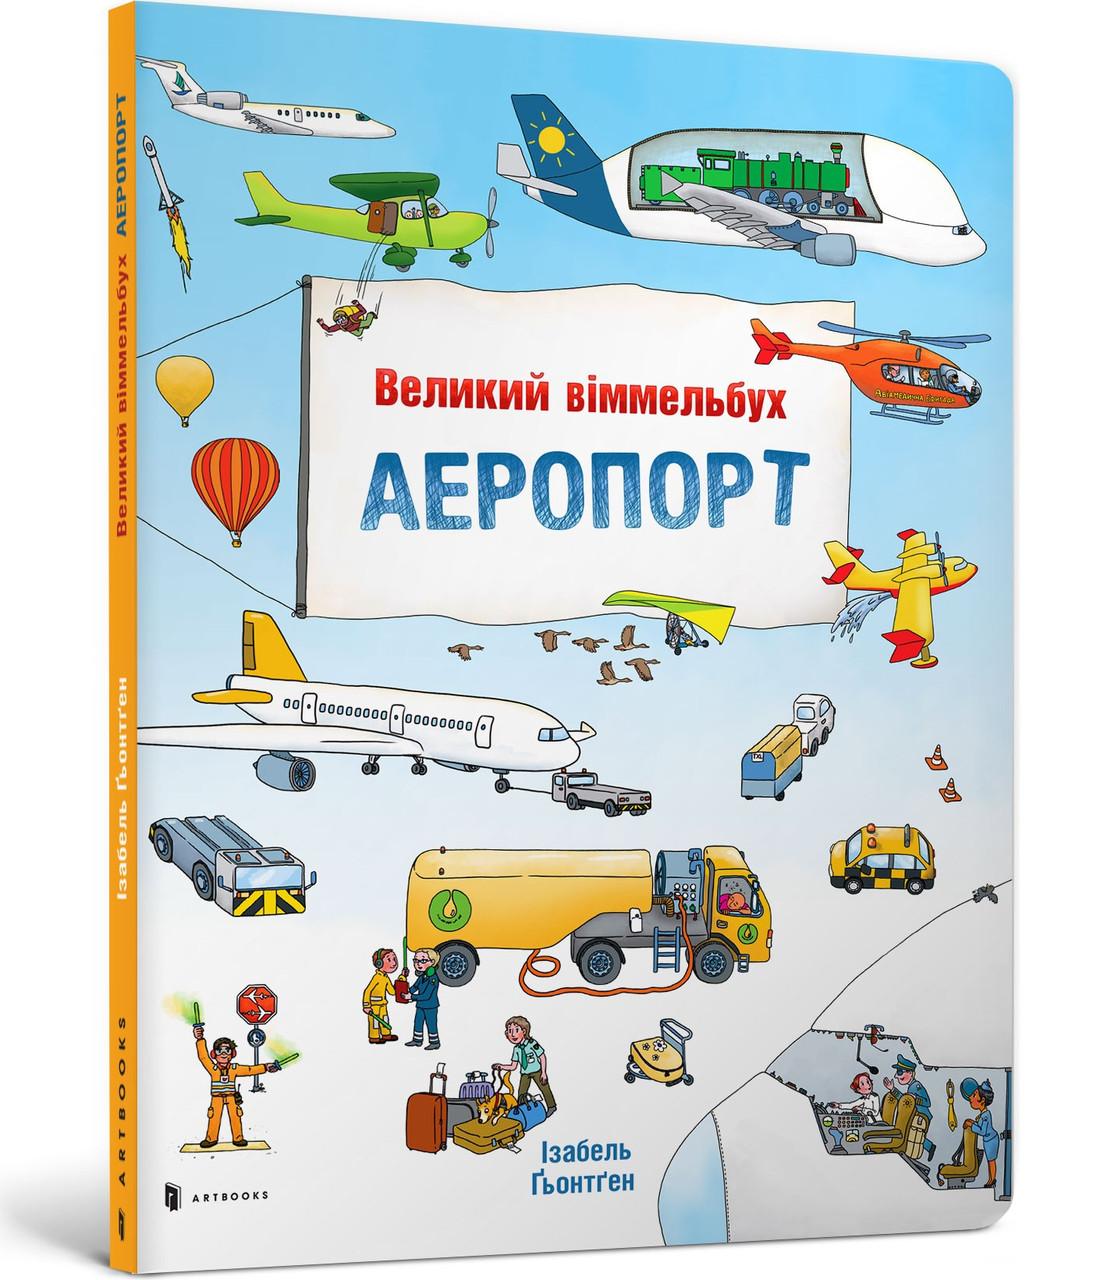 Великий віммельбух Аеропорт. Книга Ізабель Гьонтґен